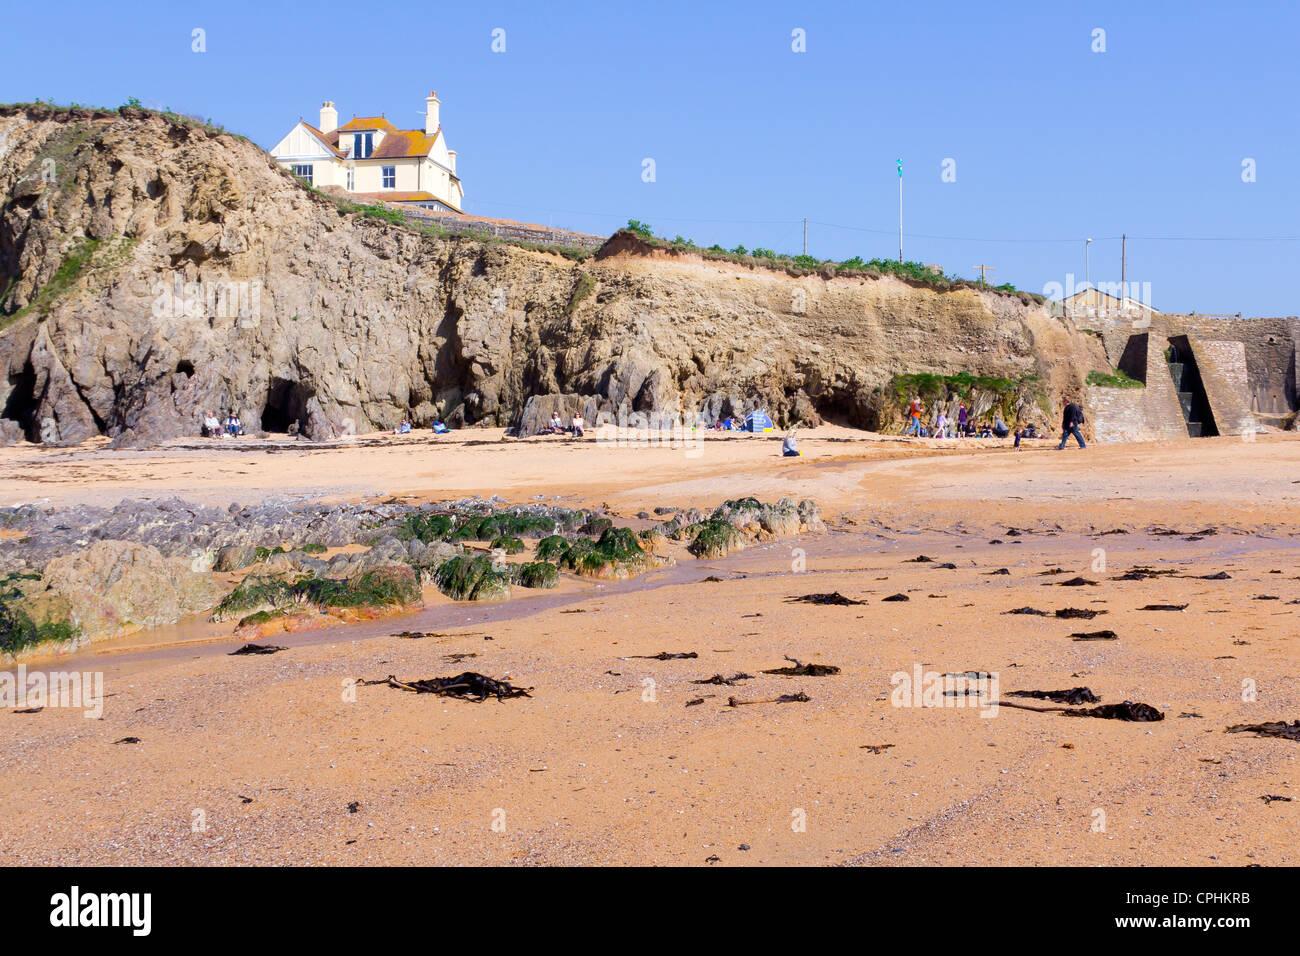 The beach at Hope Cove, South Hams Devon England UK - Stock Image